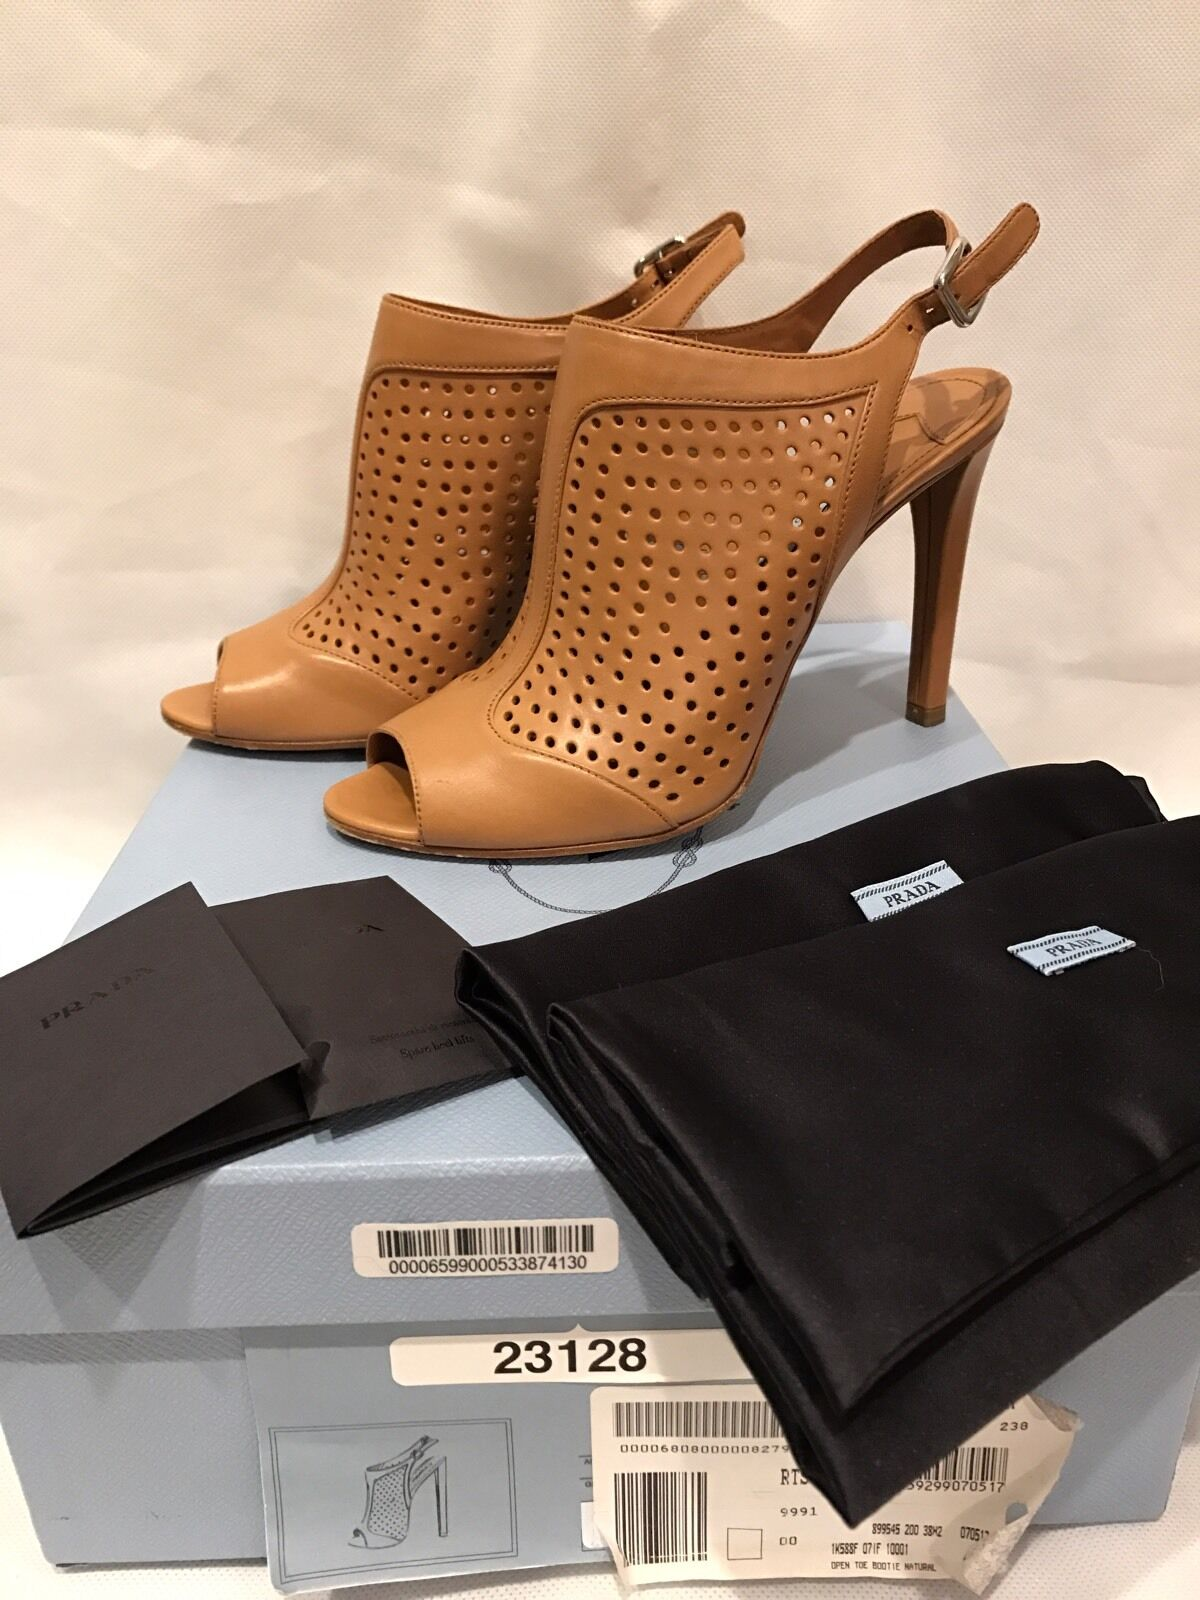 PRADA Camel Brown Perforated Open Toe Ankle Booties Sandals Heels 38